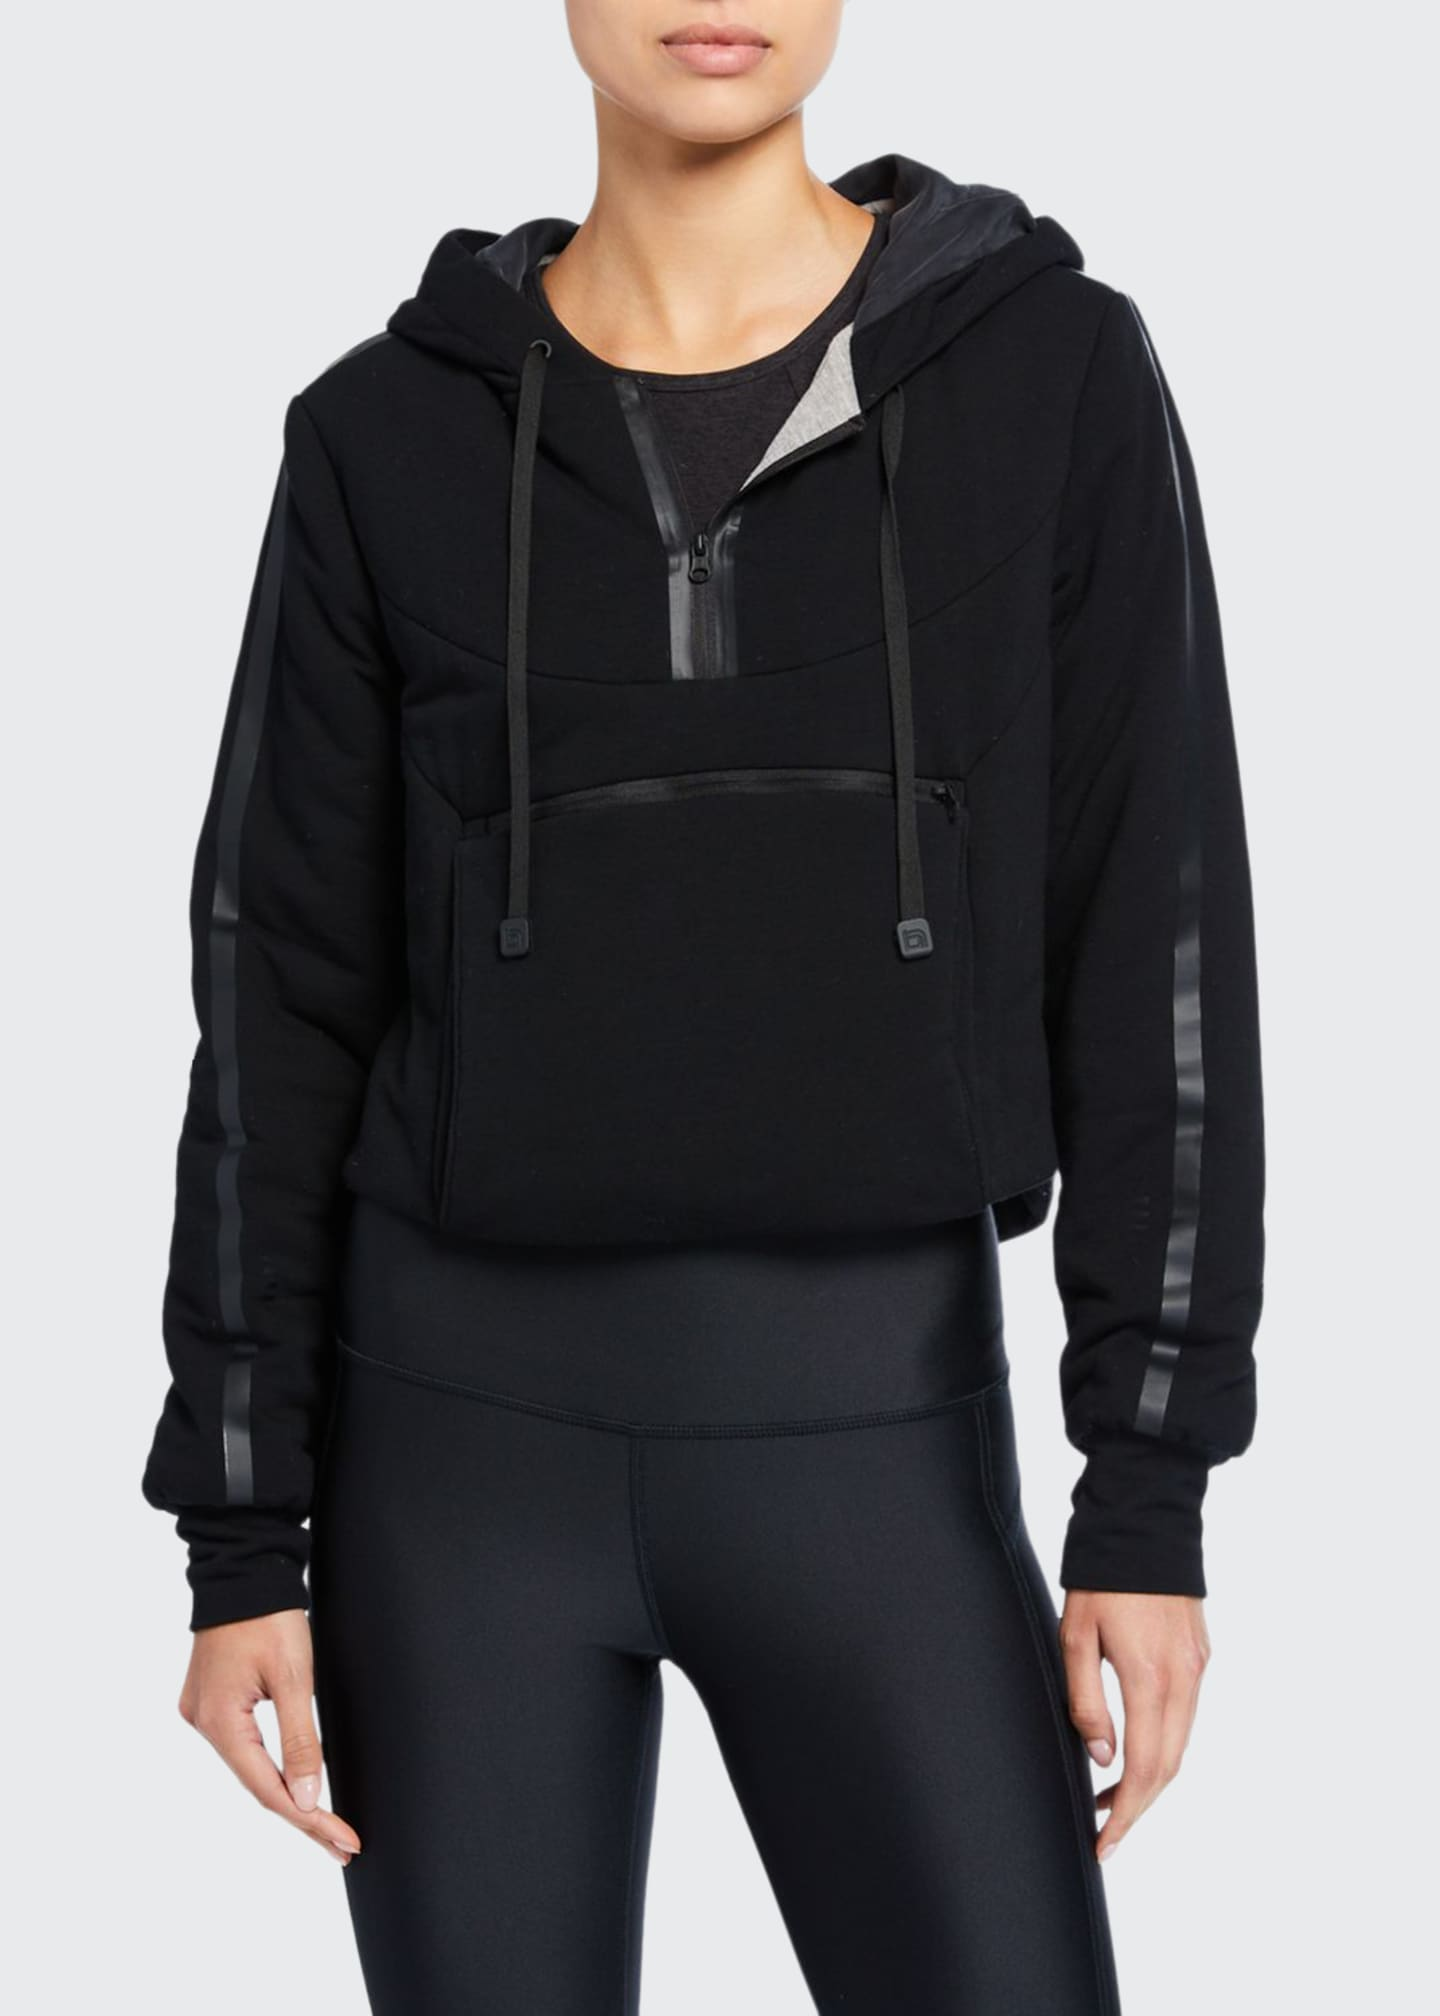 Blanc Noir Cropped Knit Packable Hoodie